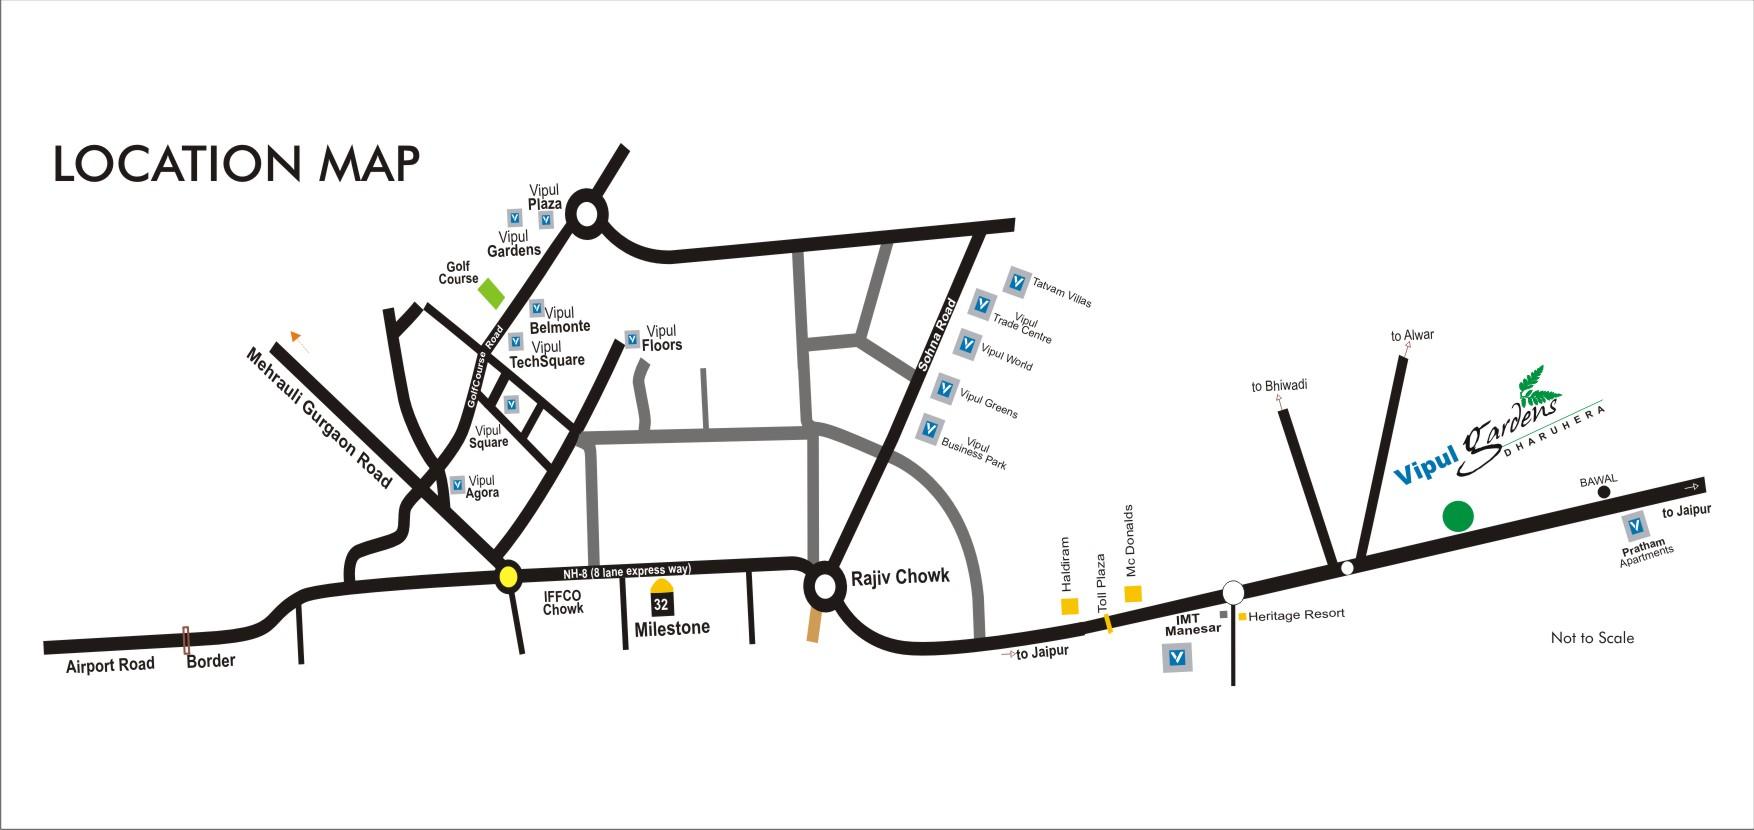 Location MapVipul Gardens